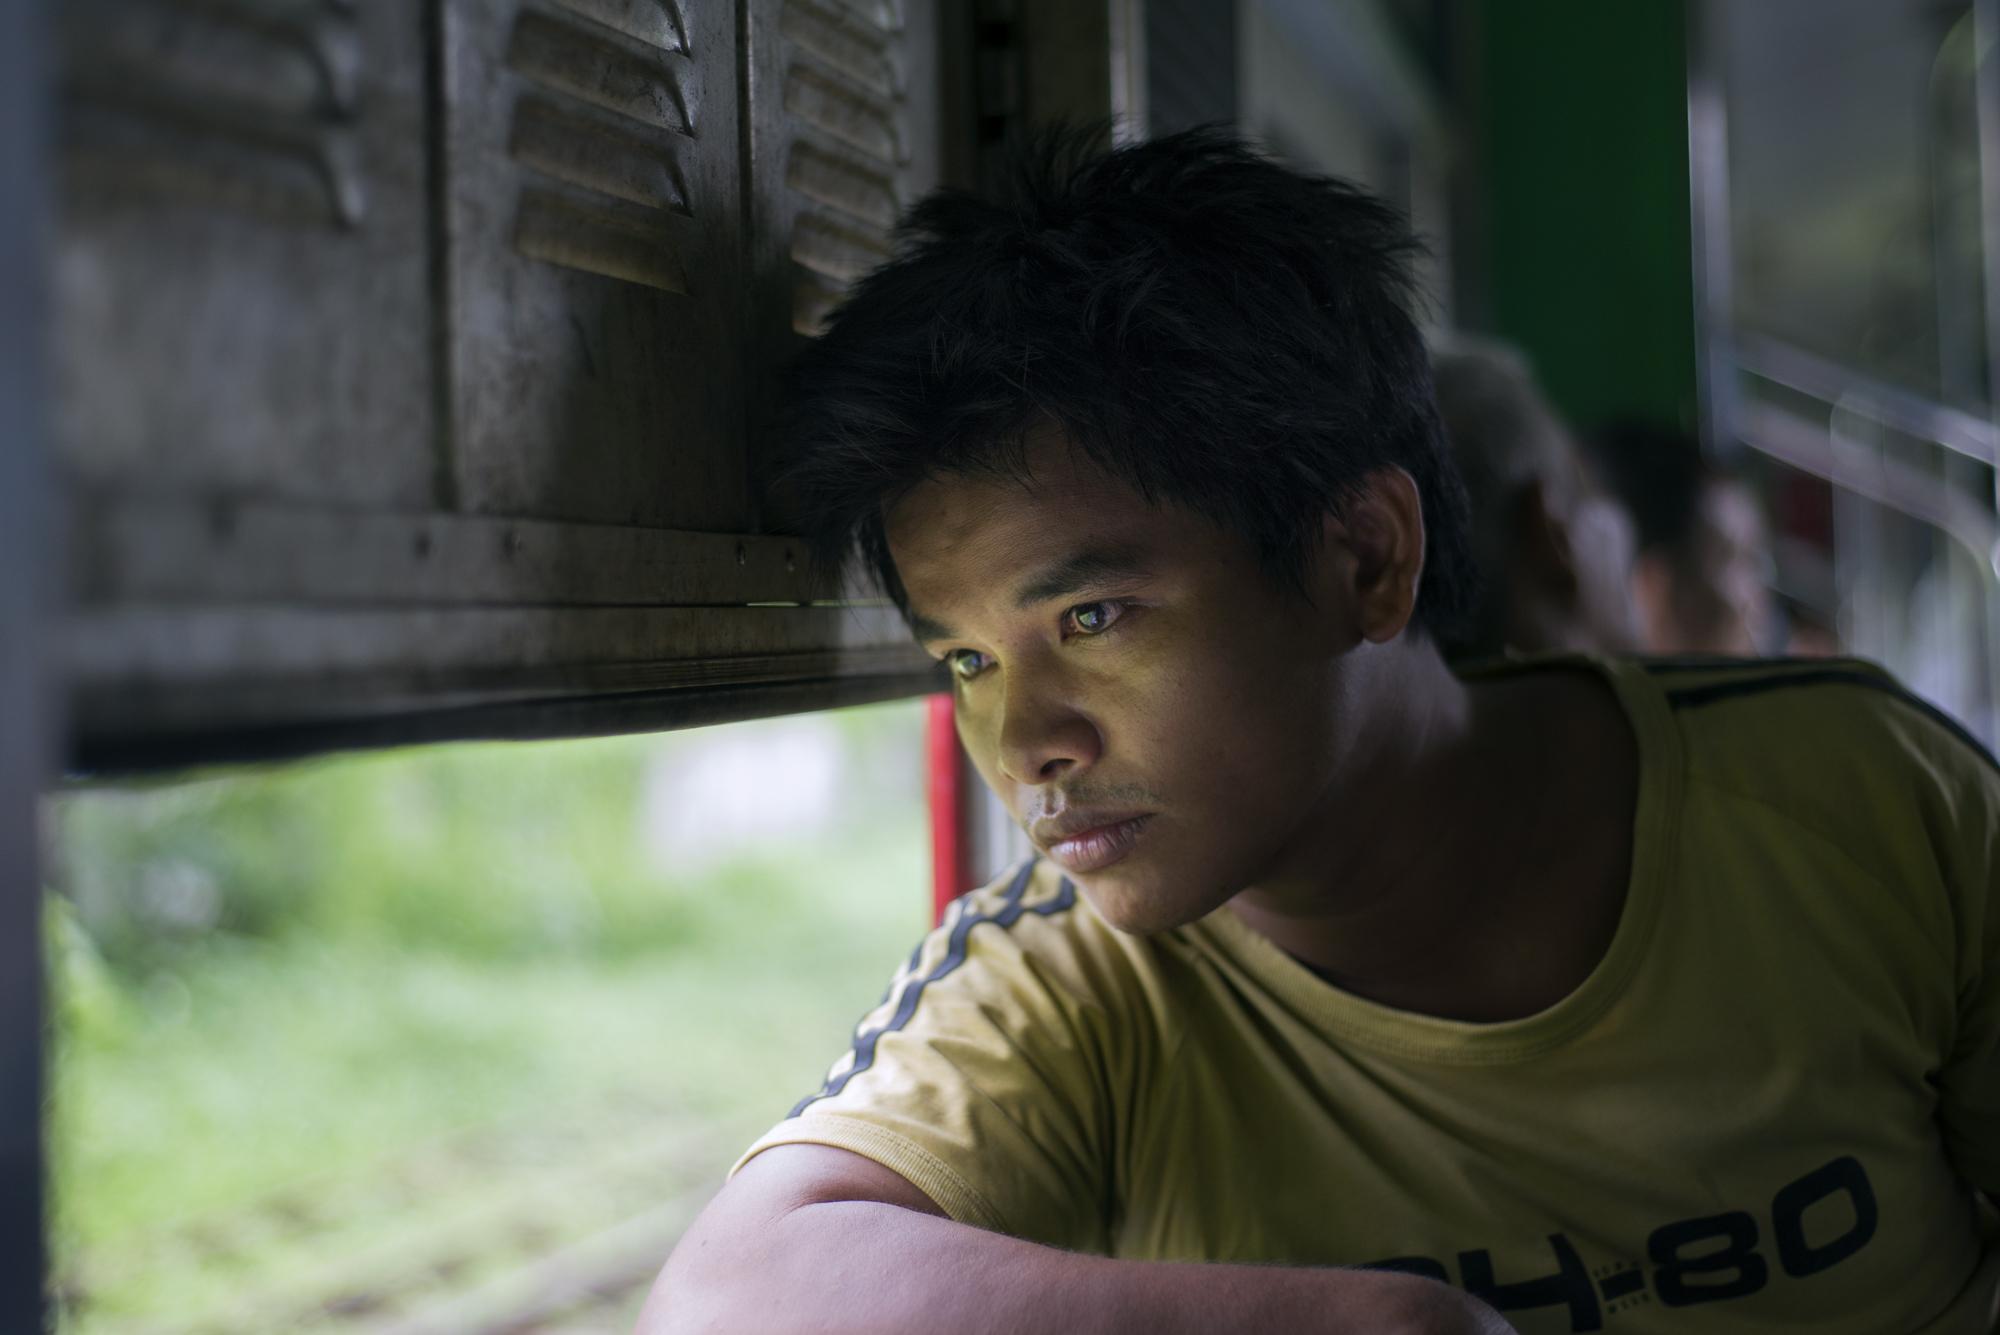 On the train in Yangon